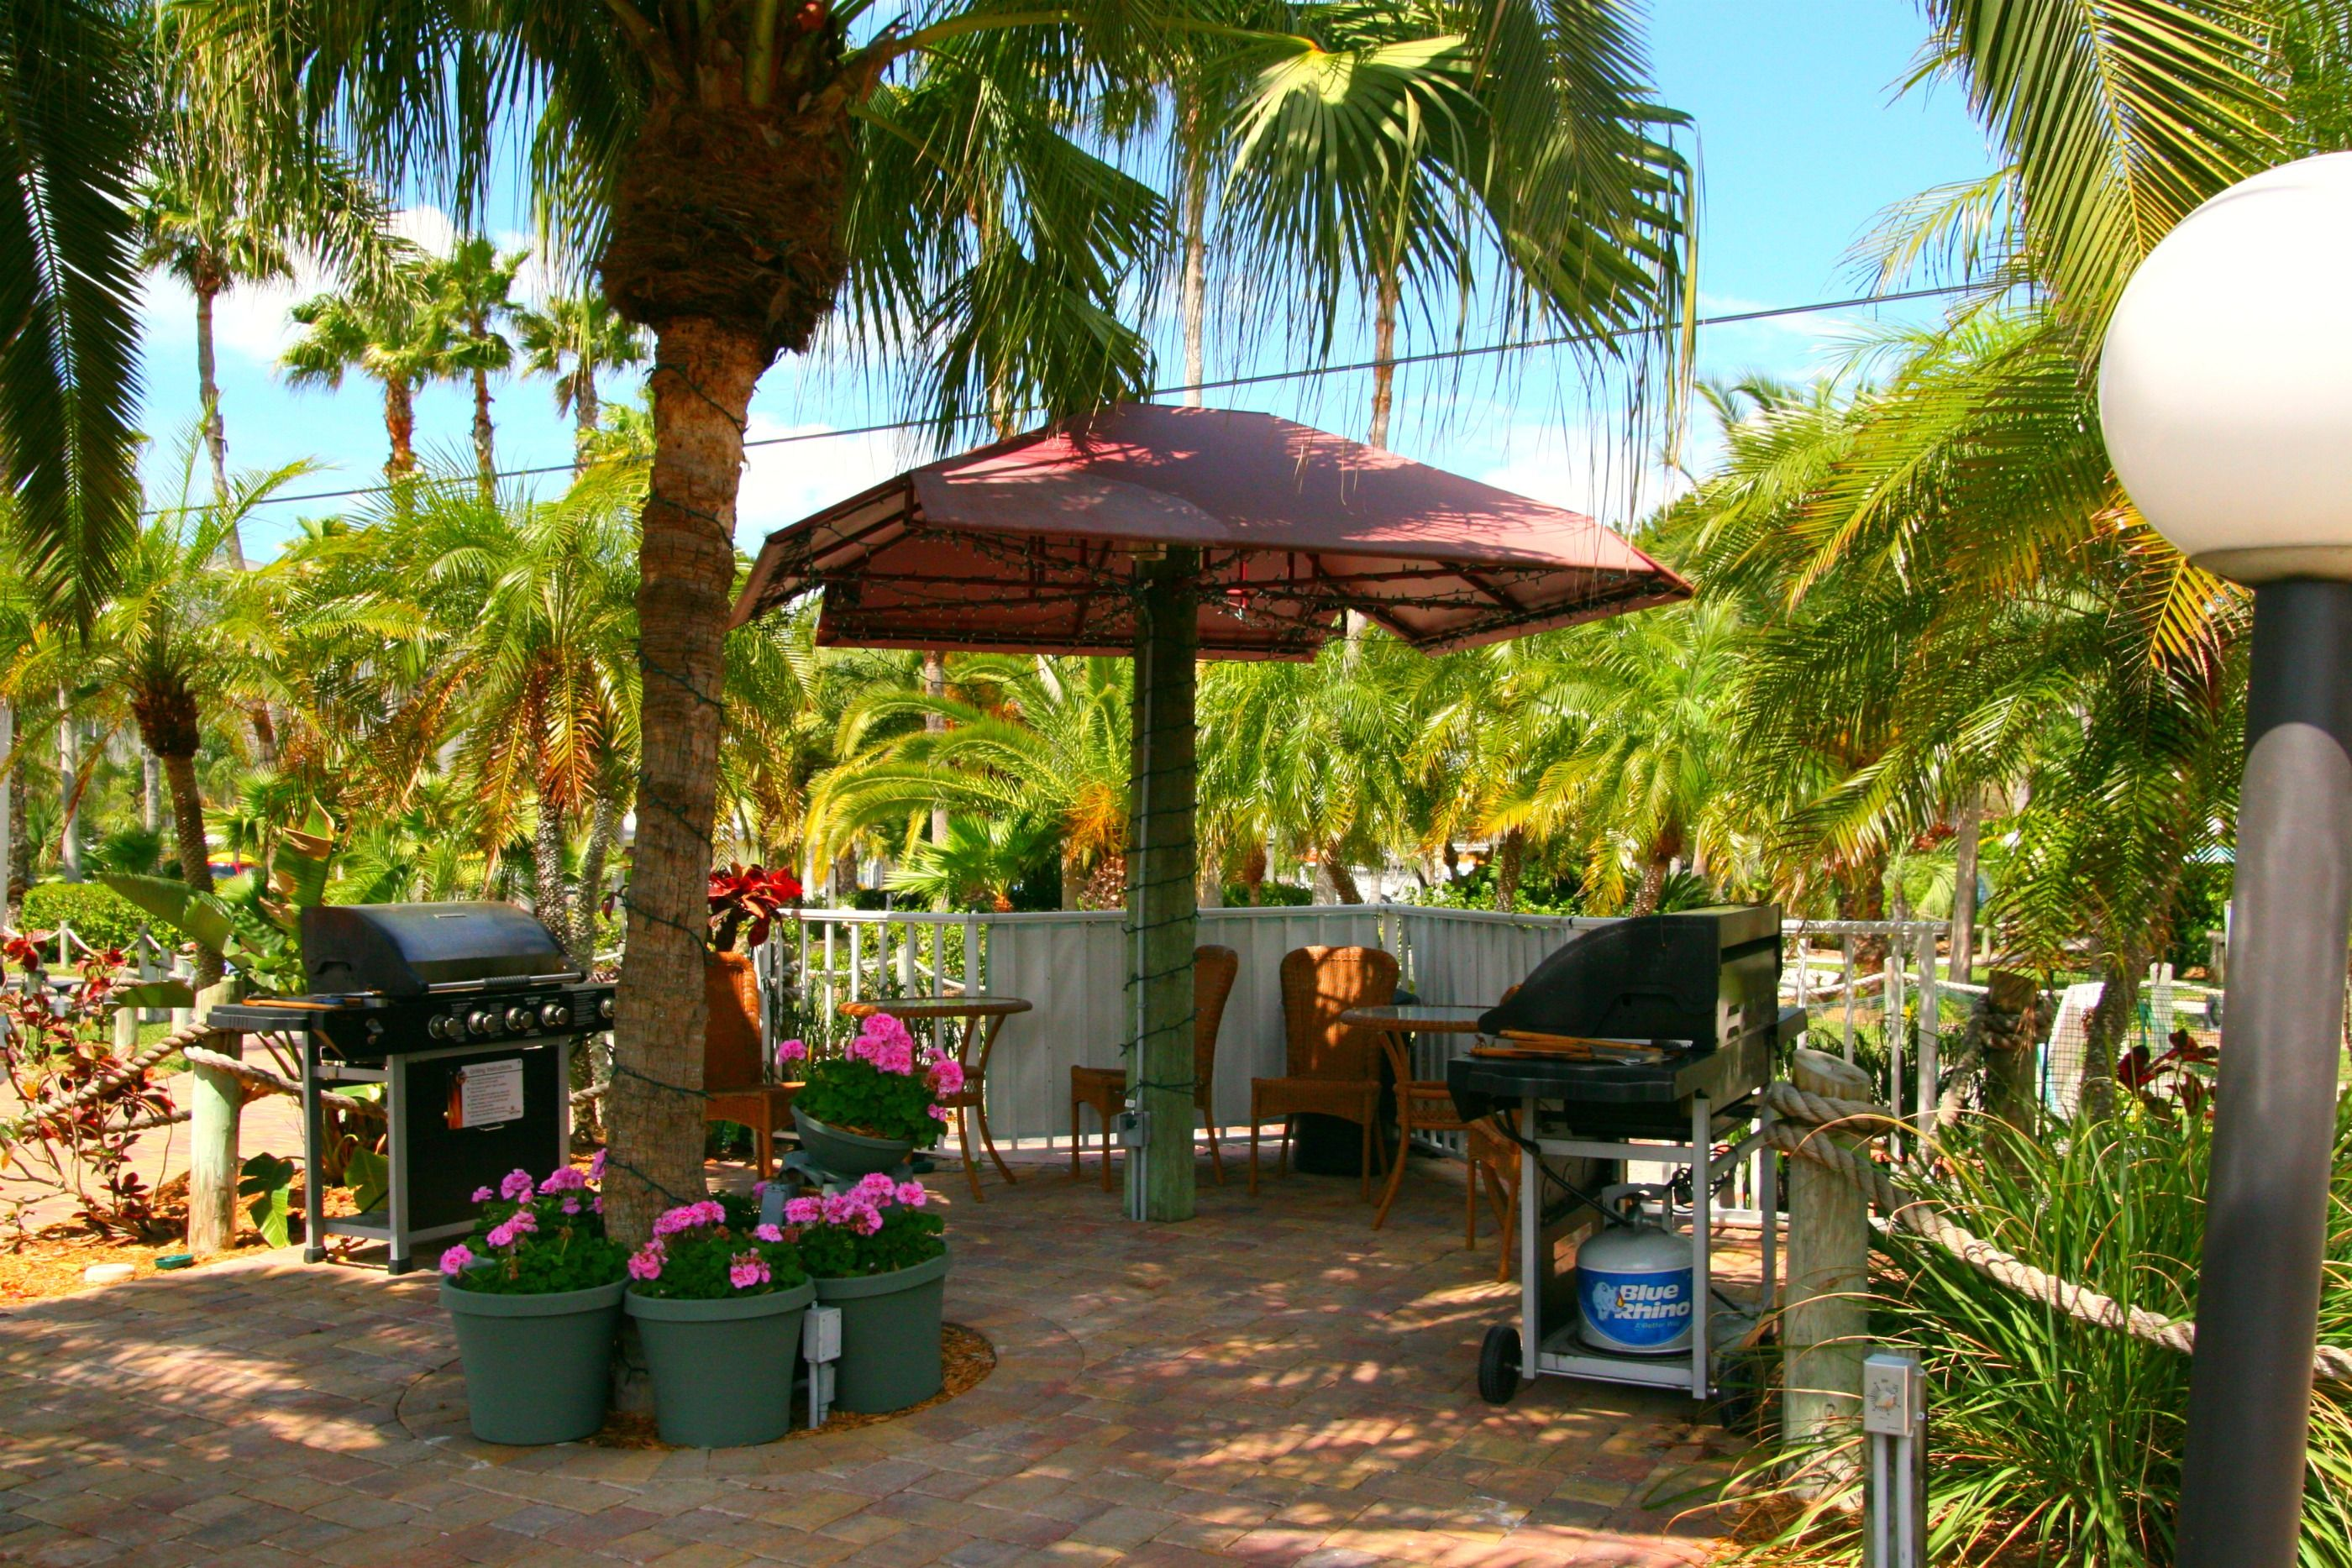 Tropical Gardens and BBQ Tiki Huts | The Resort | Pinterest | Tiki ...